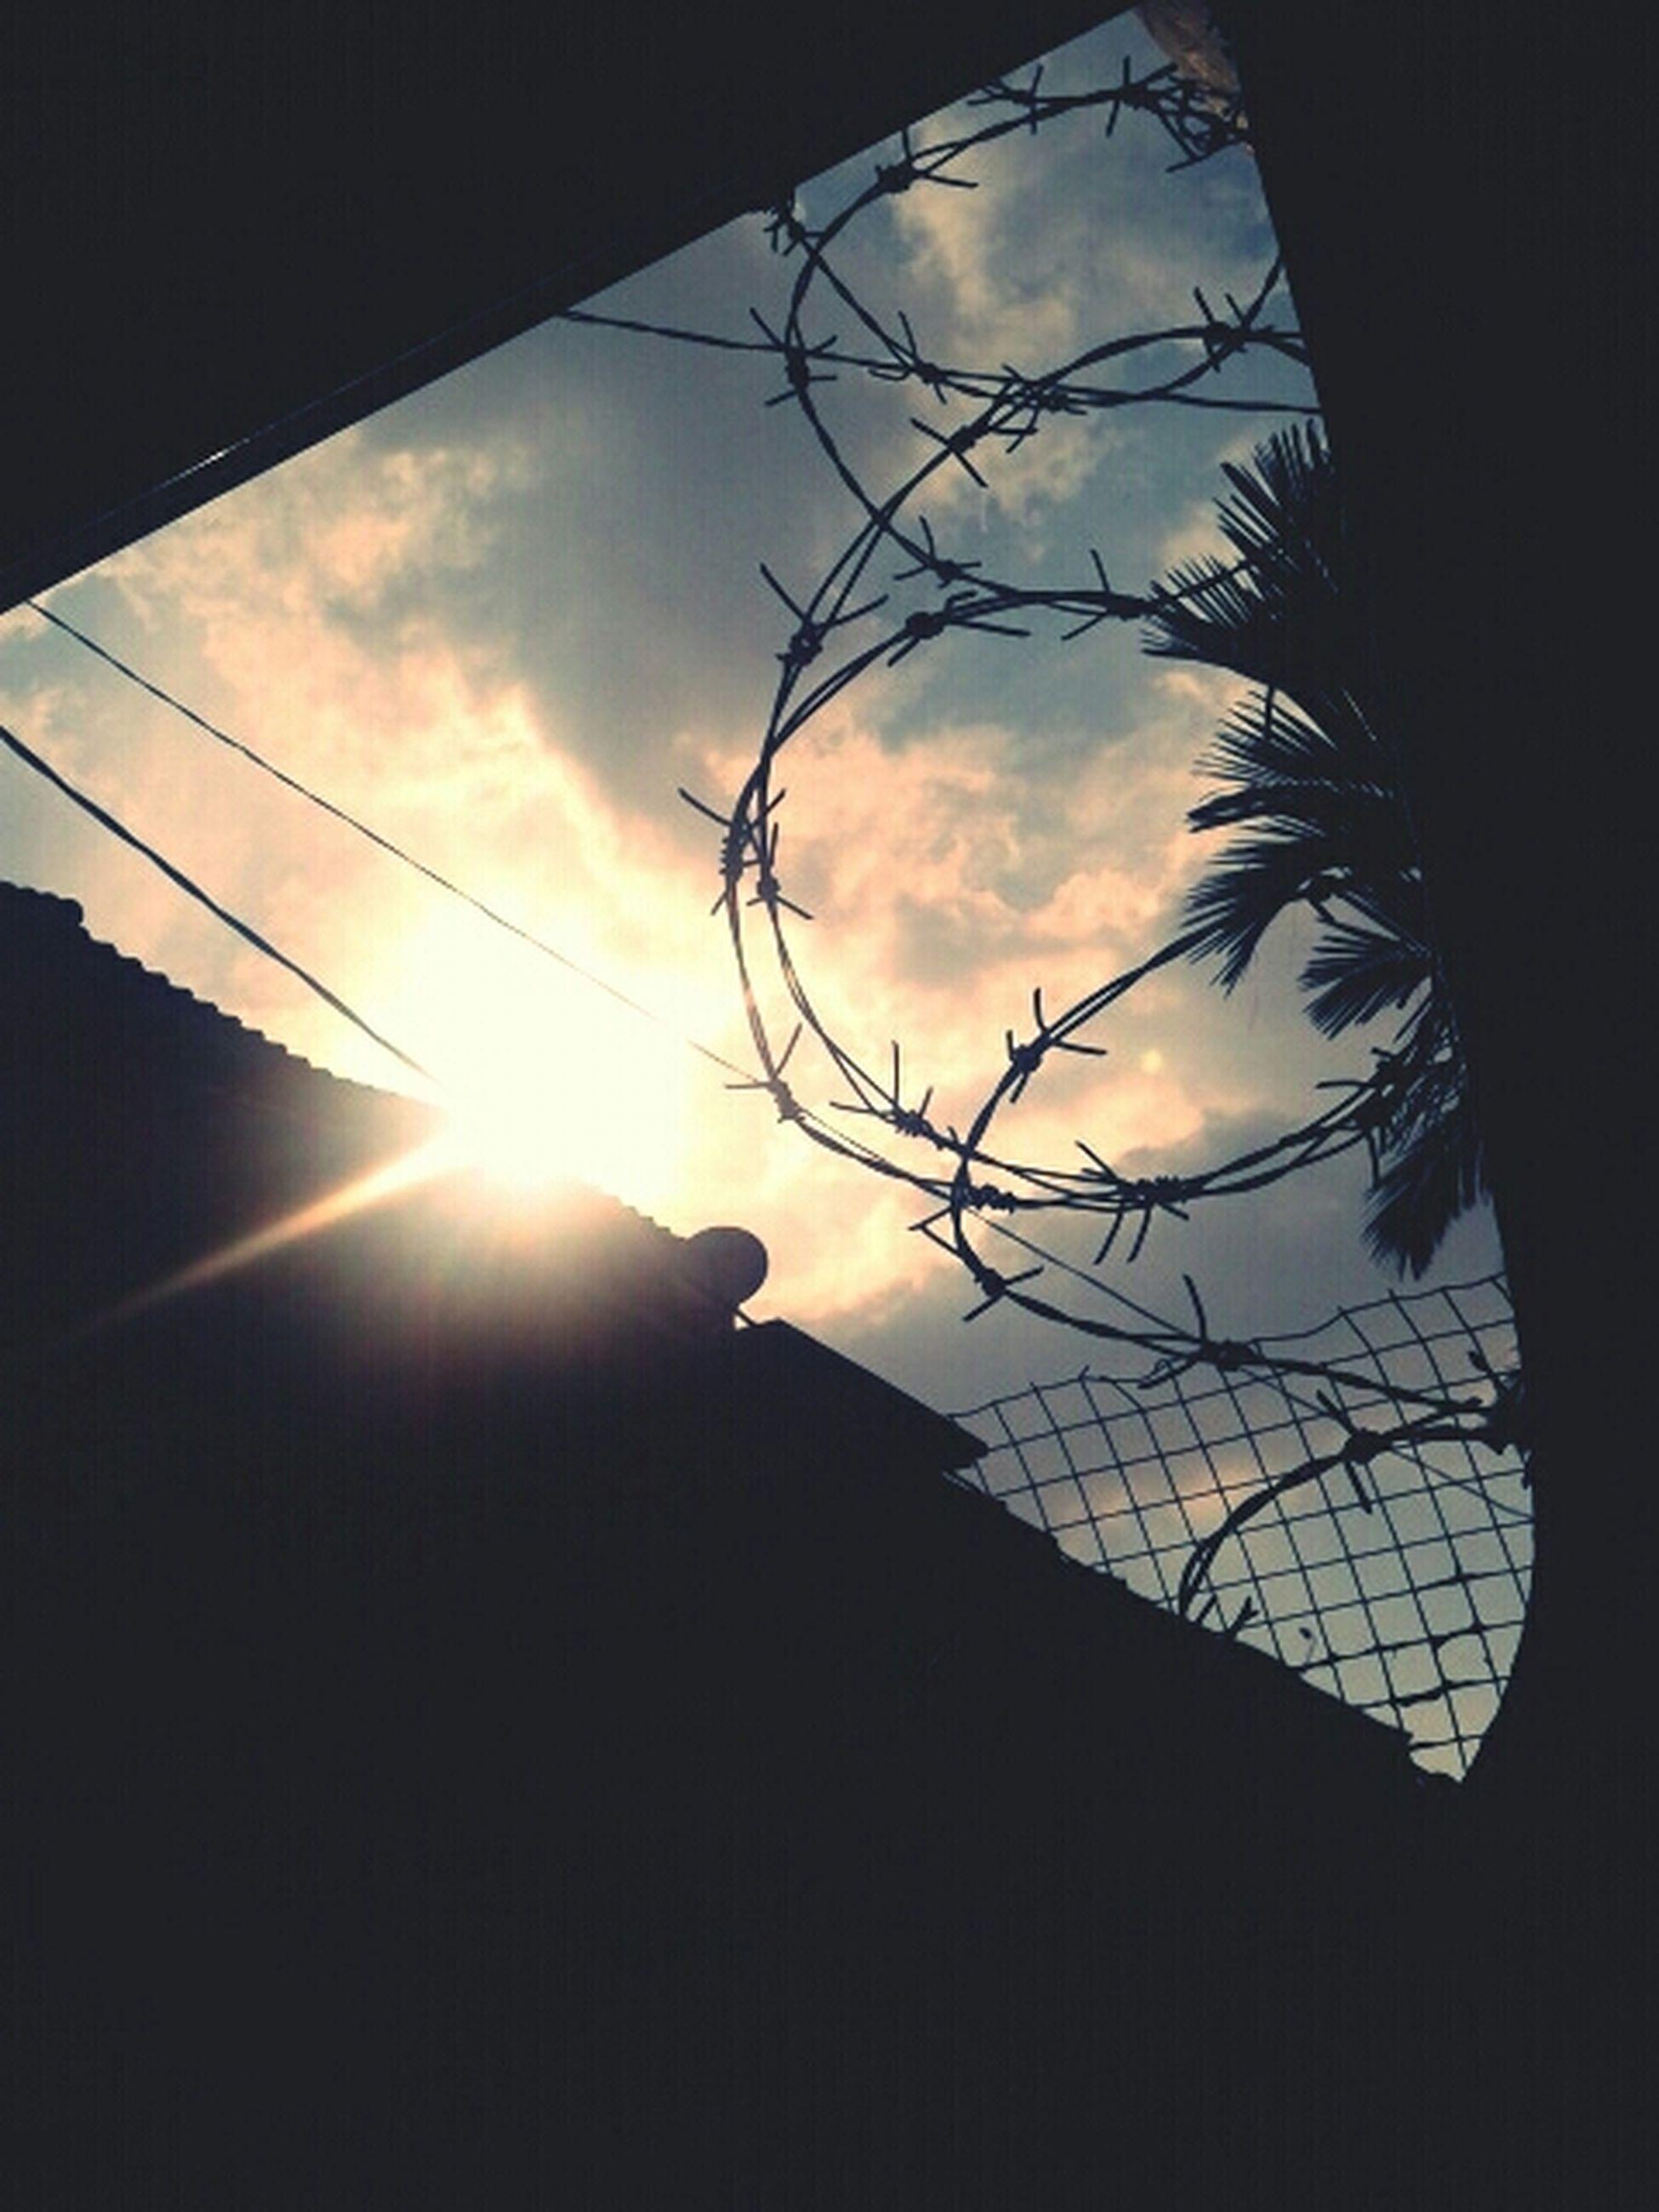 silhouette, low angle view, sun, sky, sunset, built structure, architecture, sunlight, cloud - sky, sunbeam, building exterior, power line, nature, lens flare, electricity, cloud, no people, outdoors, electricity pylon, cable